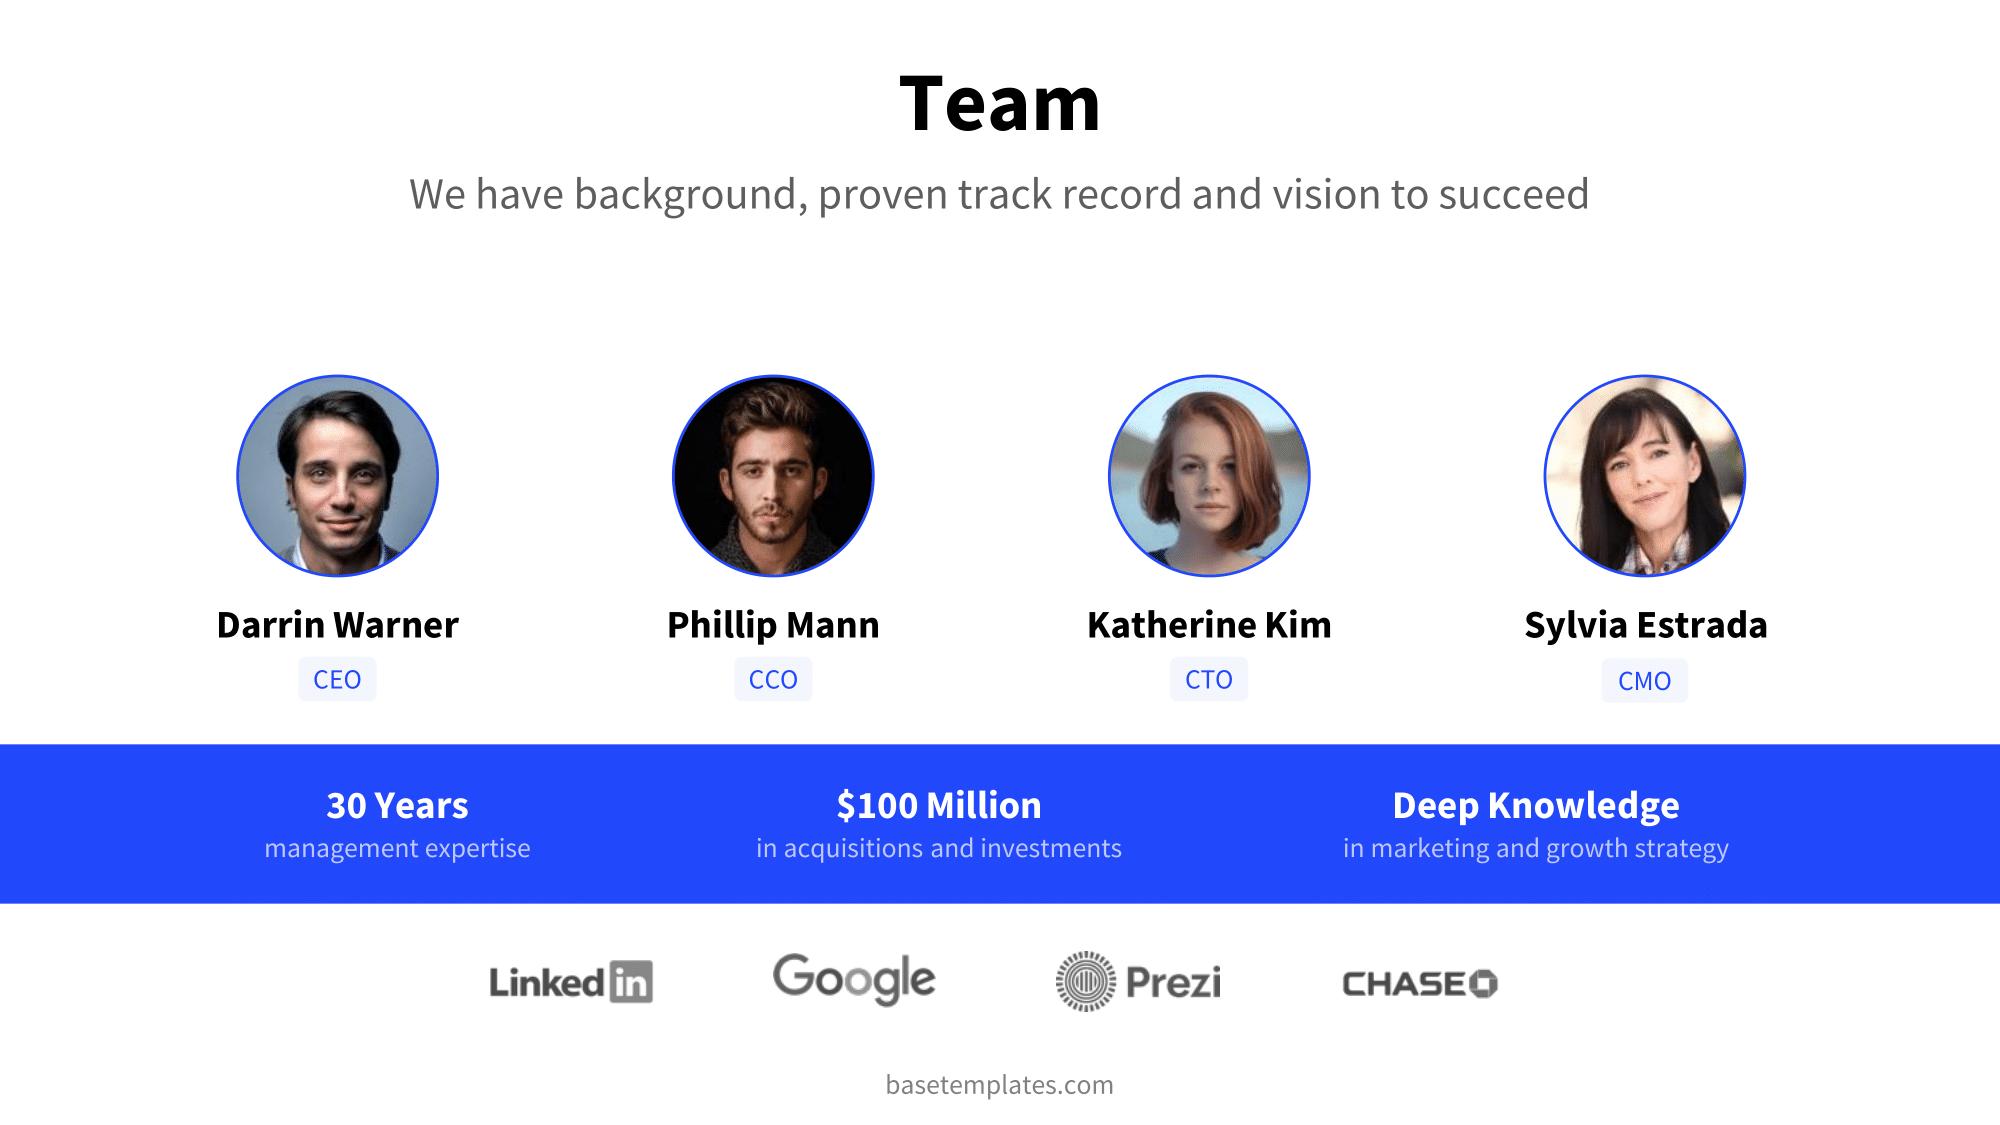 Team slide with c-level management